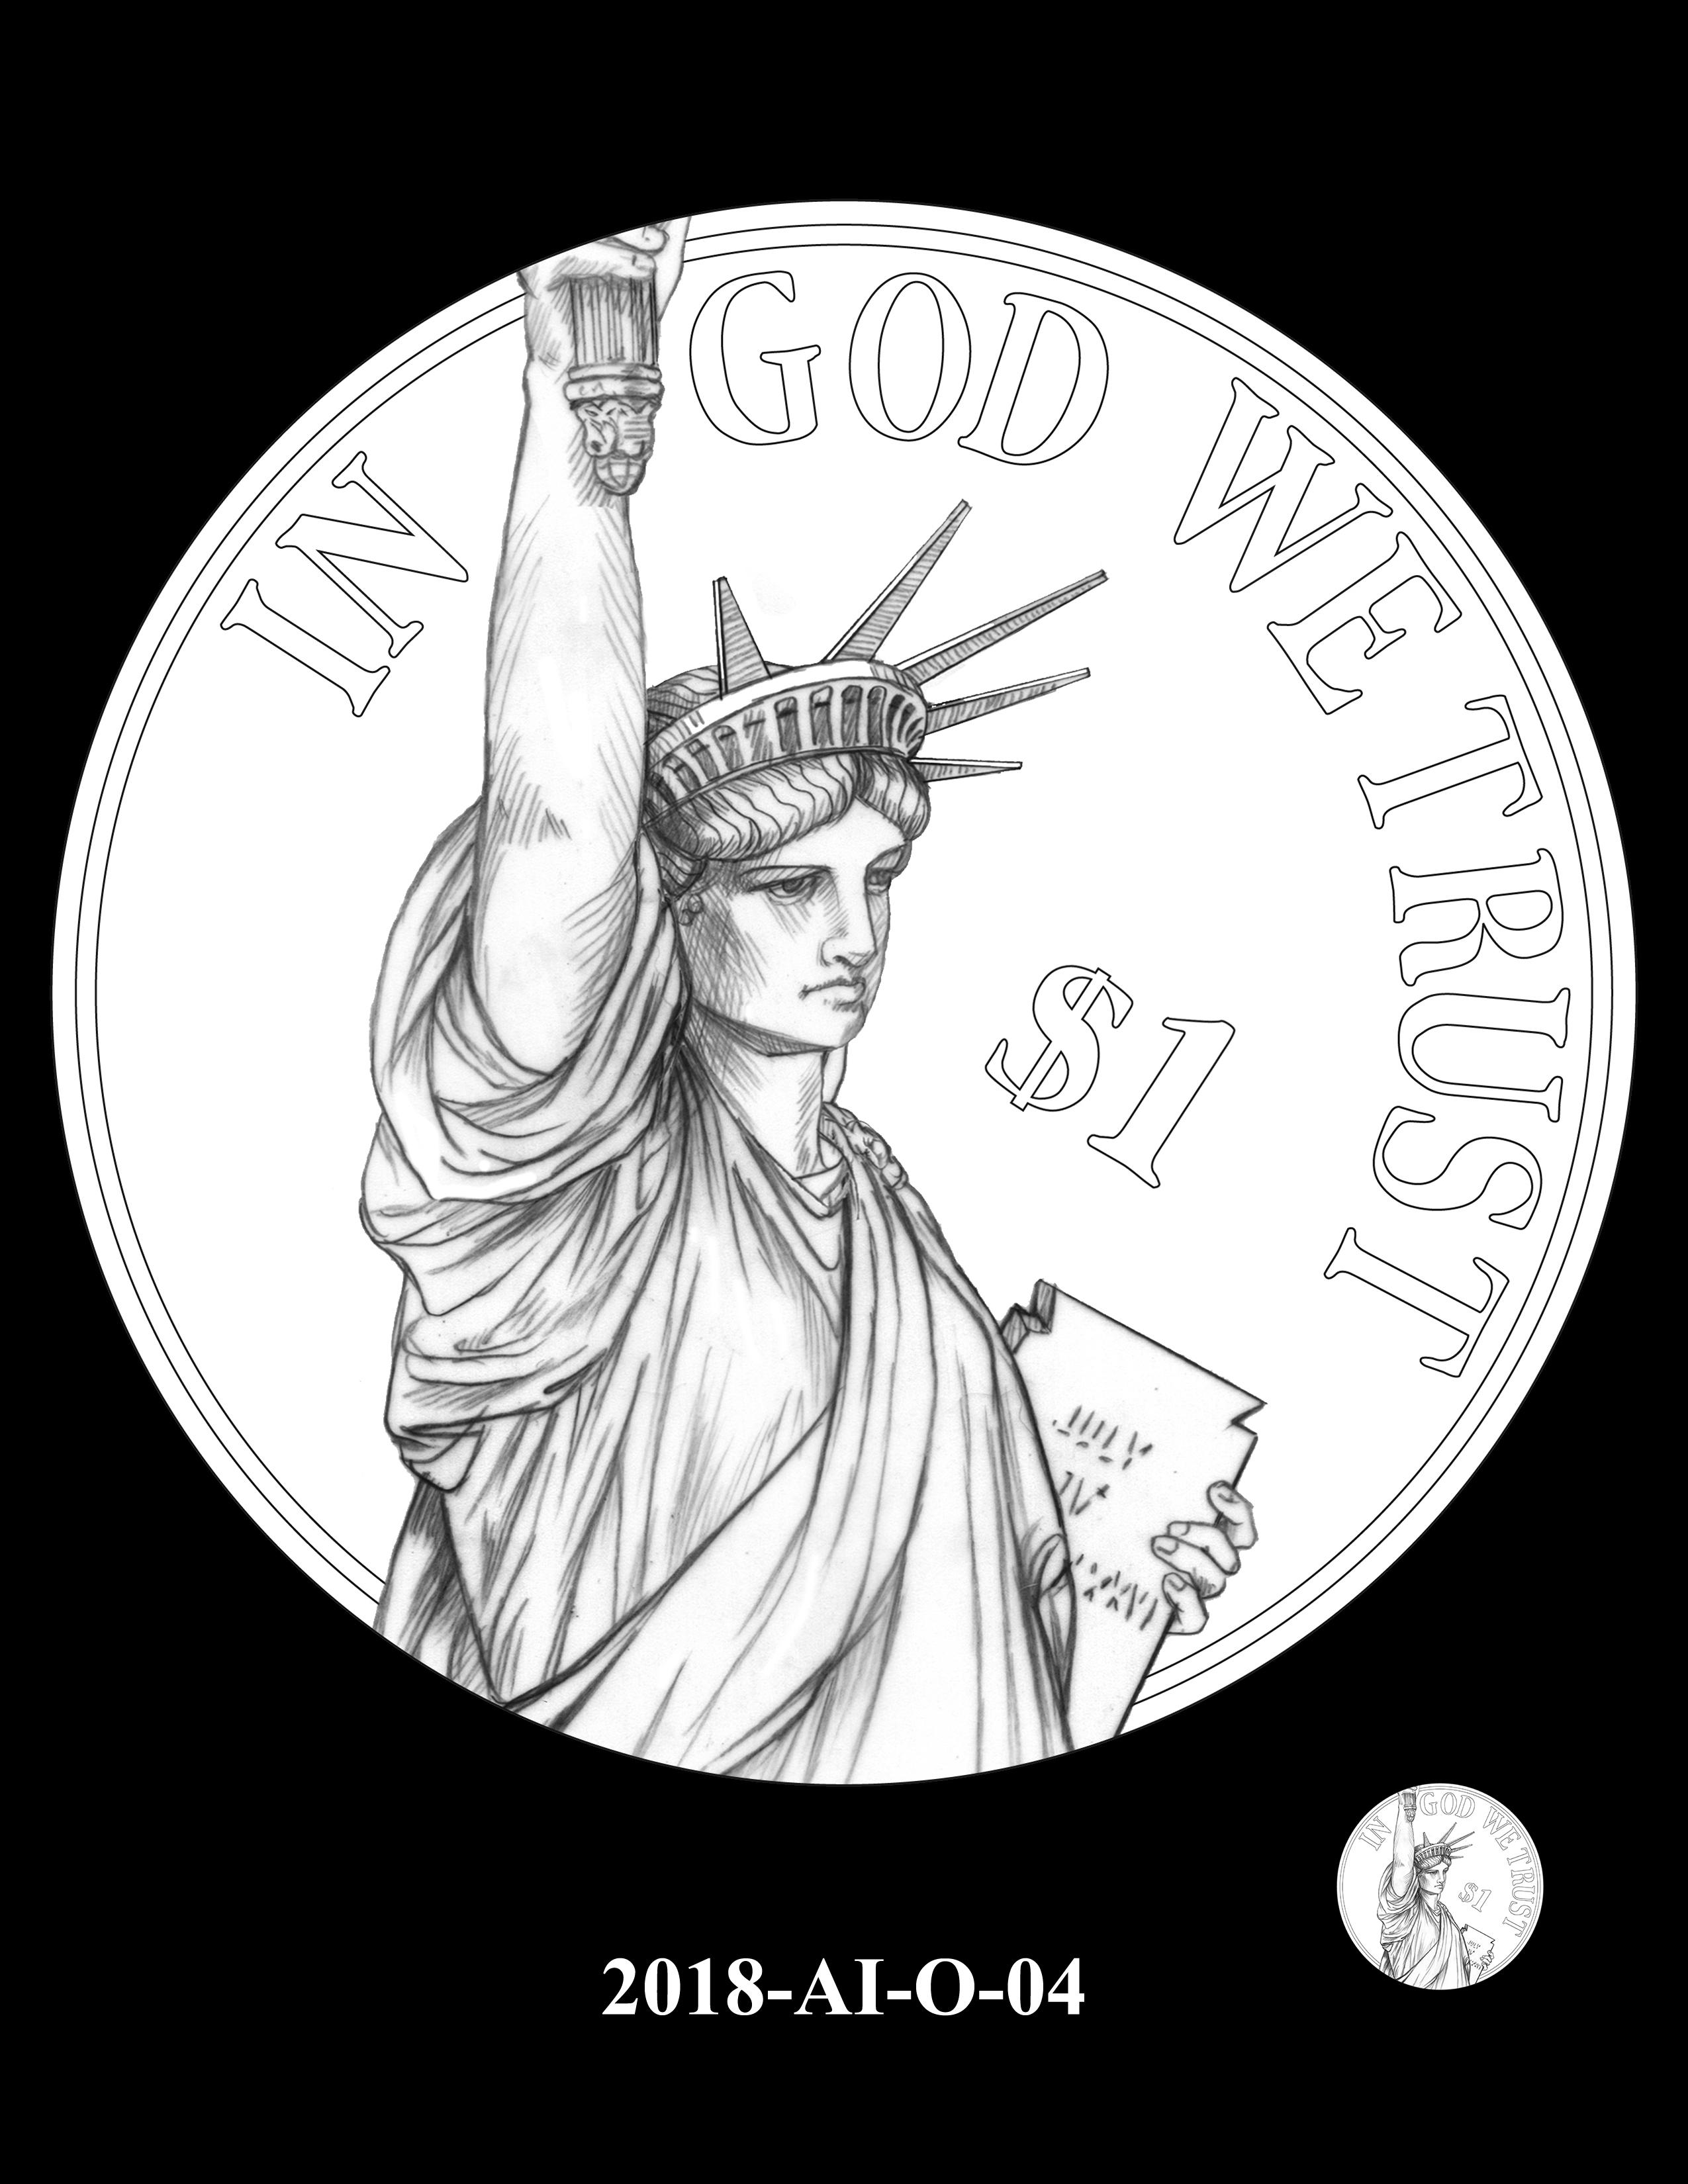 2018-AI-O-04 -- 2018 American Innovation $1 Coin